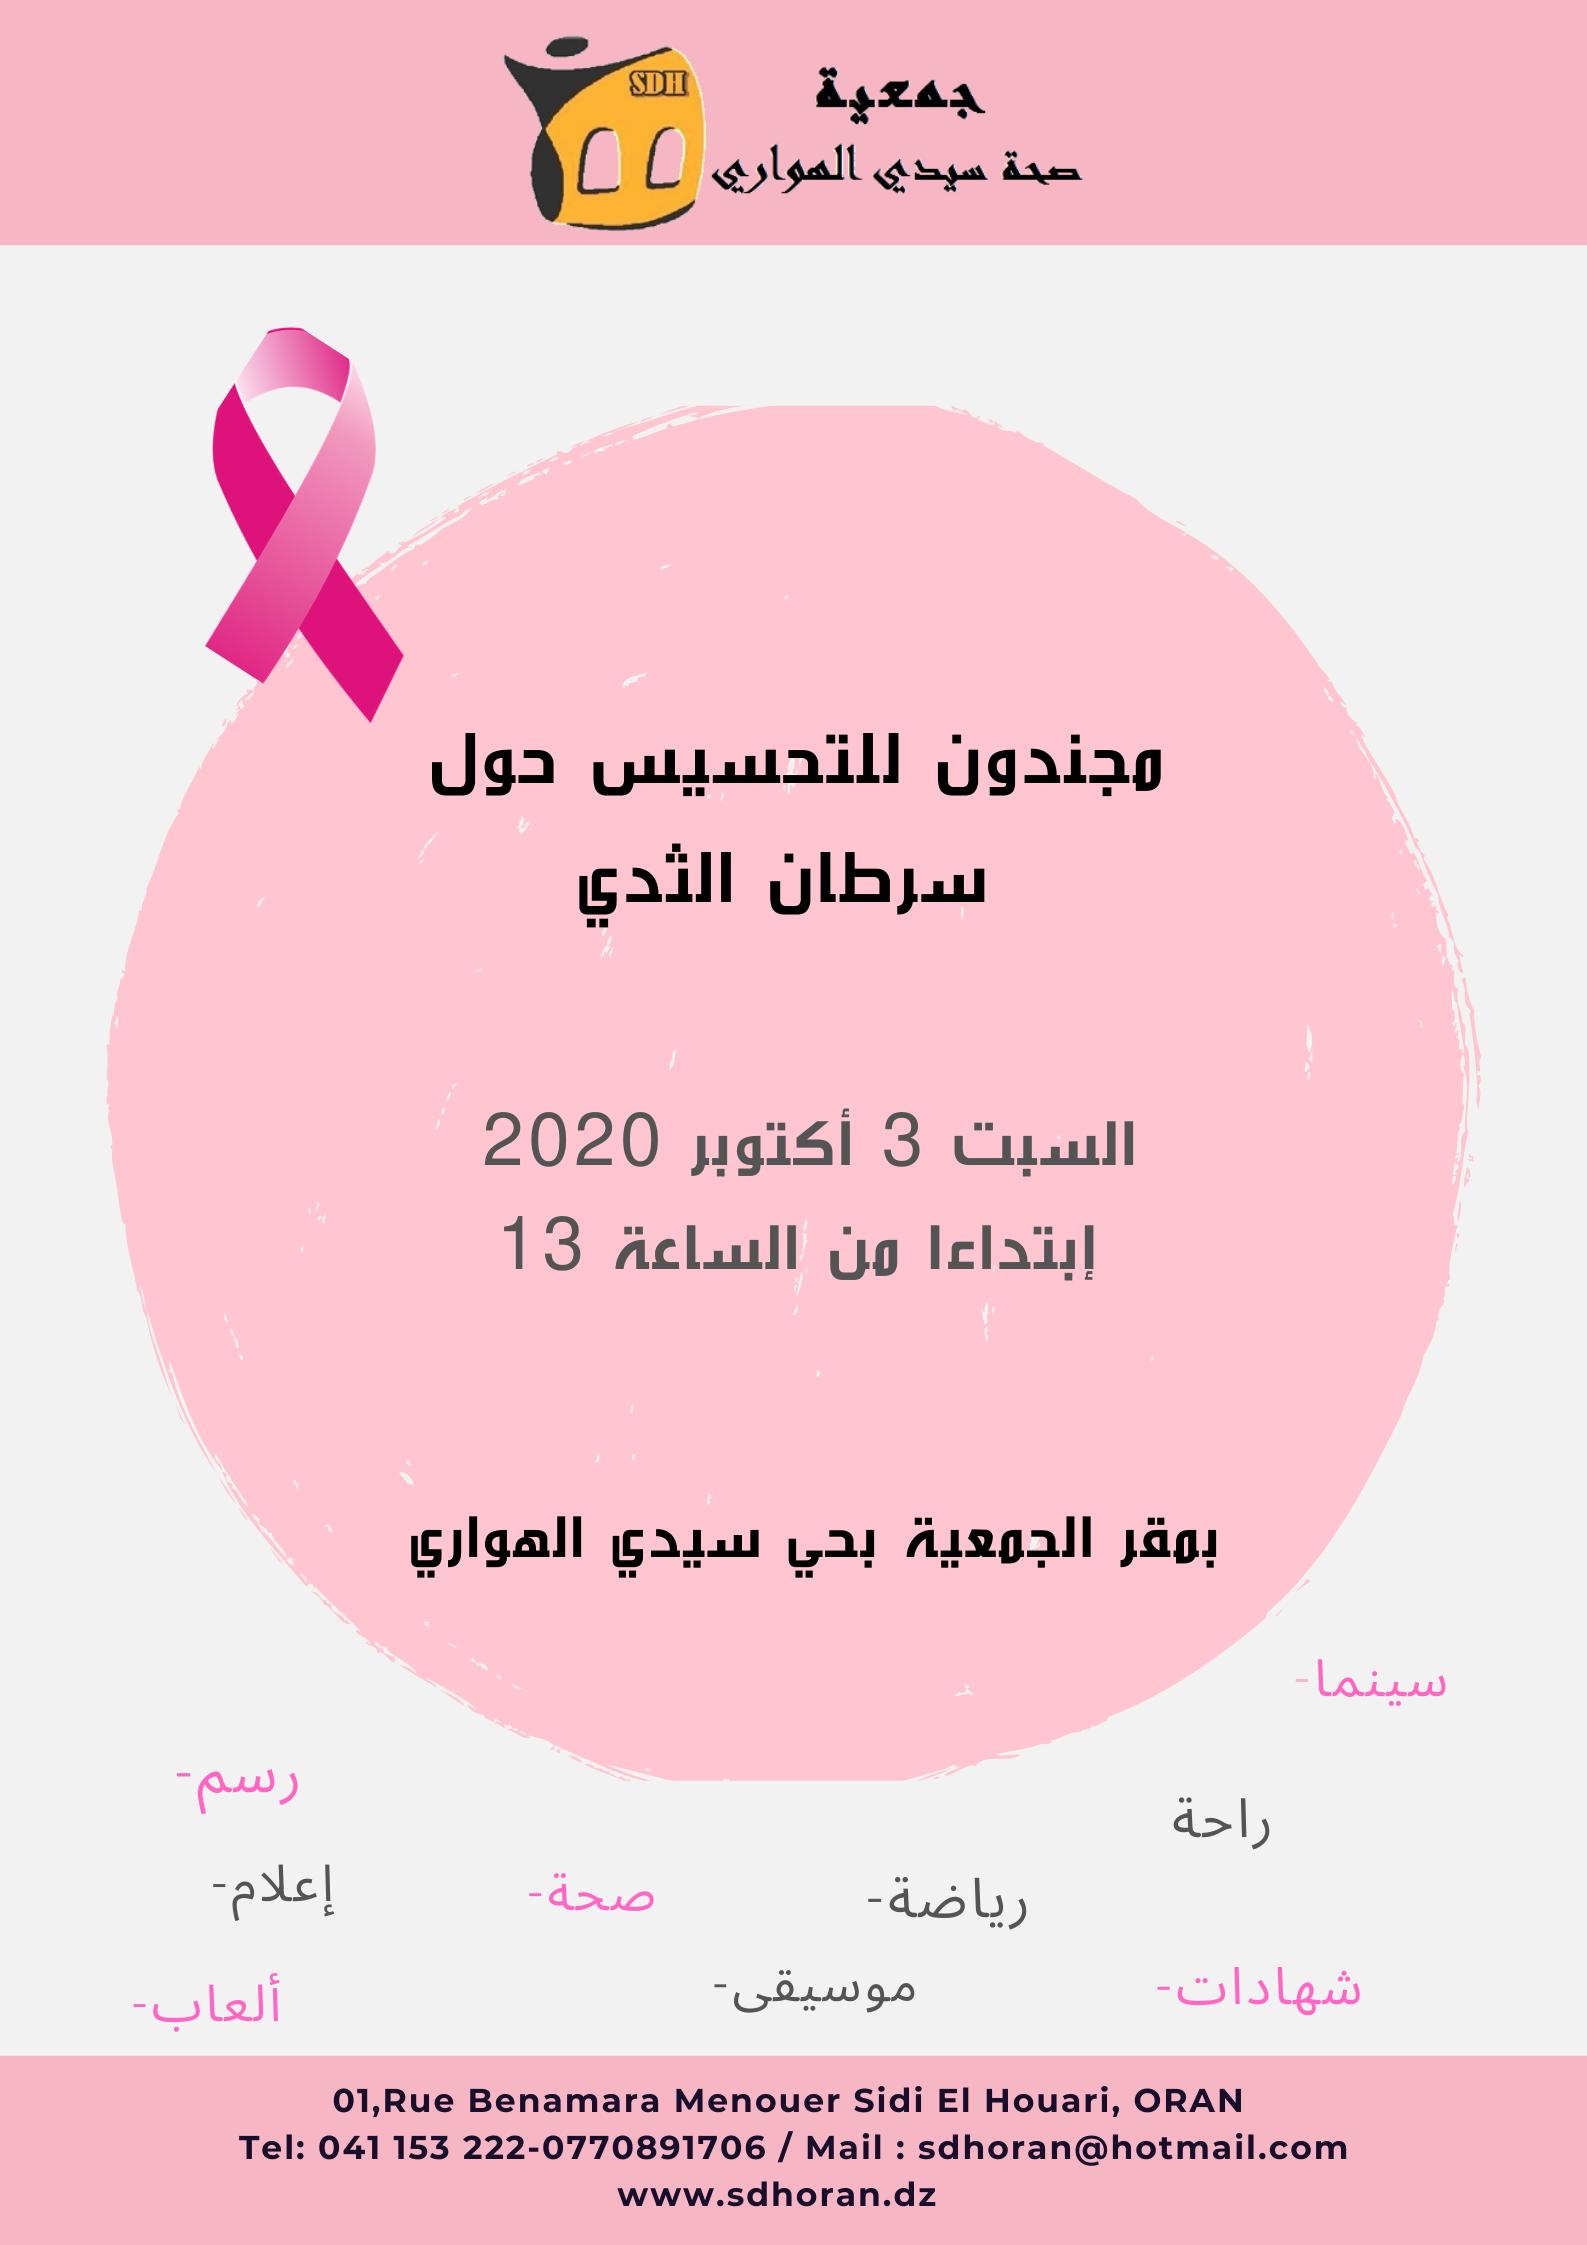 إنطلاق برنامج الشهر الوردي Octobre Rose - Santé SIDI EL HOUARI (SDH)